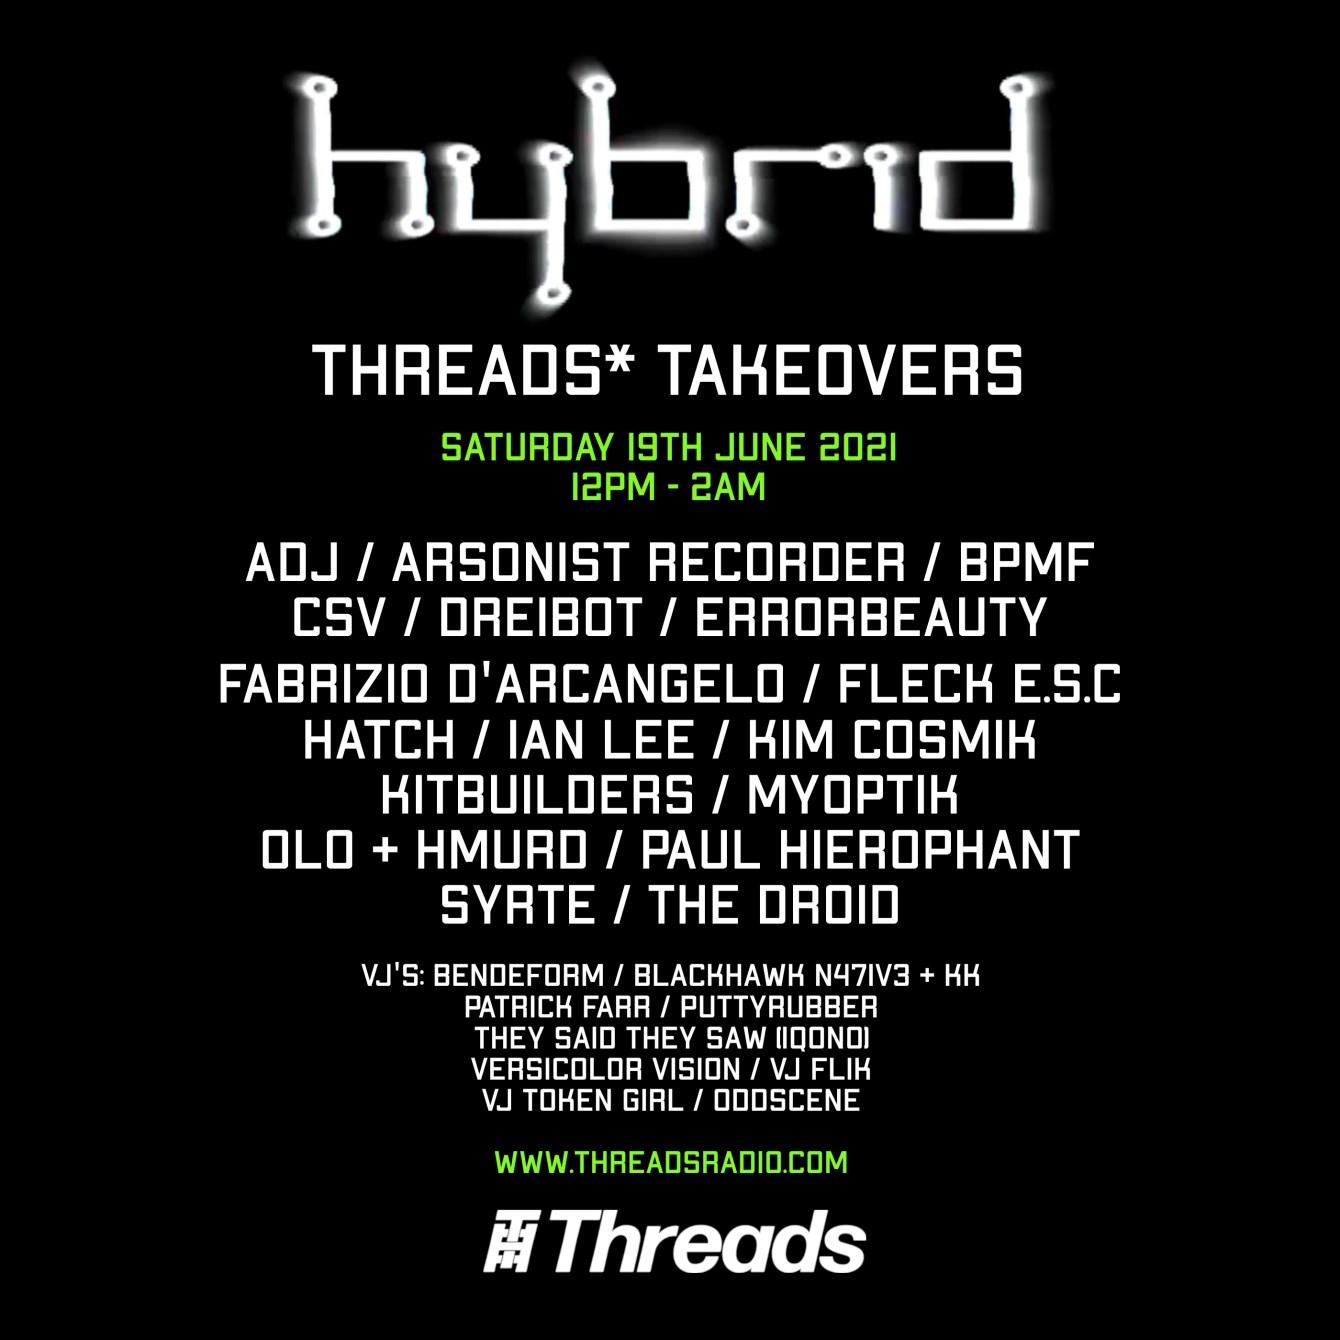 Hybrid Threads* Takeover June 2021 - Flyer front